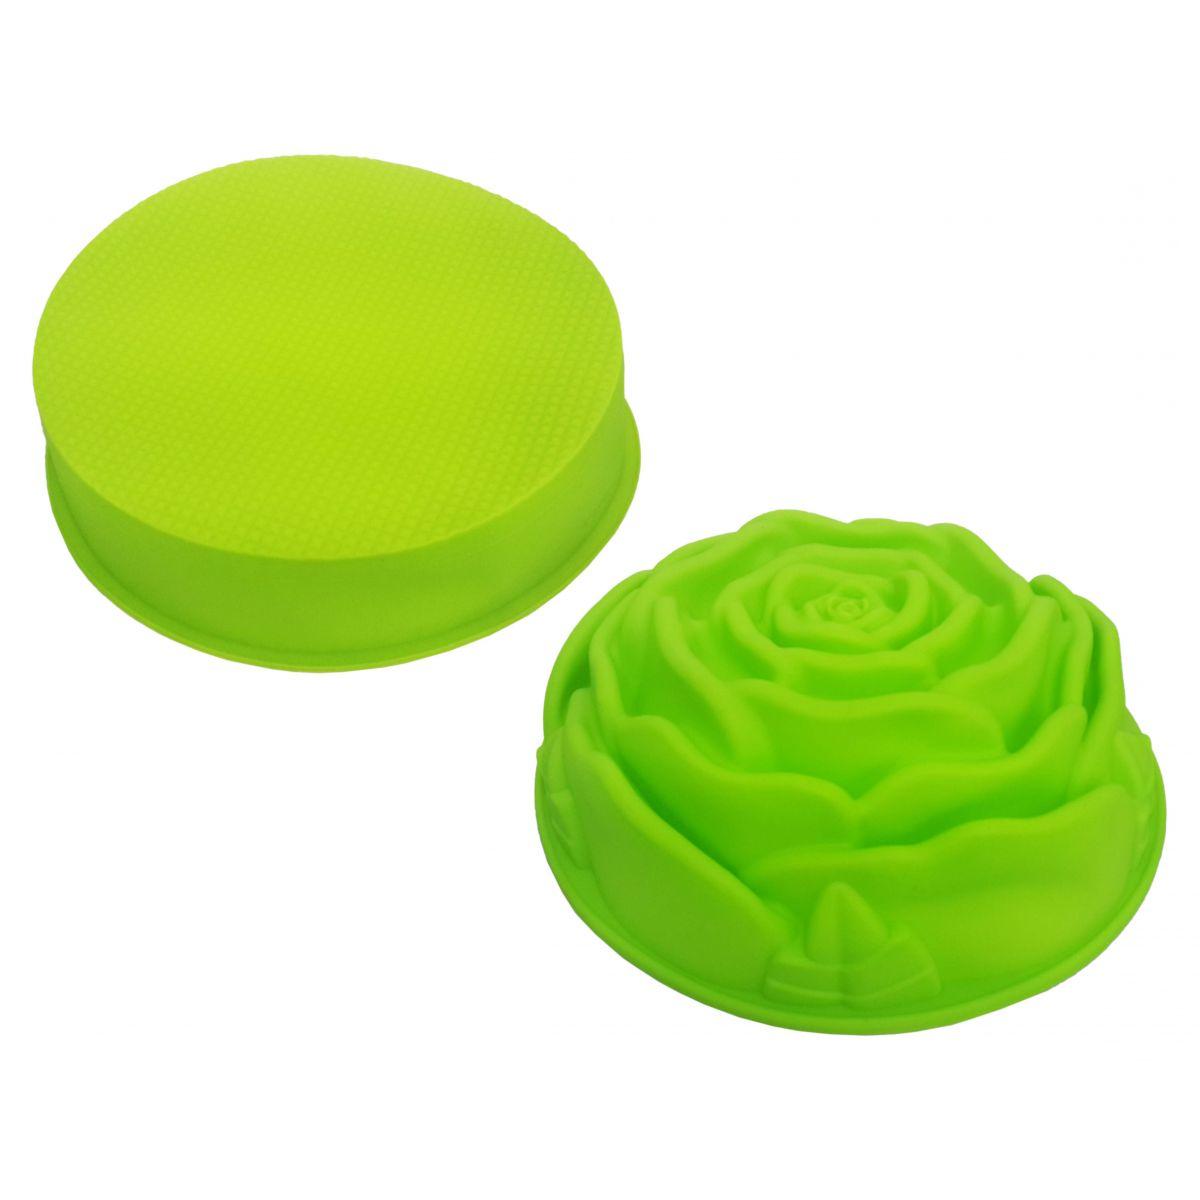 Conjunto Silicone Cozinha 2 Forma Doce Torta Flor Redonda Verde (kit2-sili-6-11)